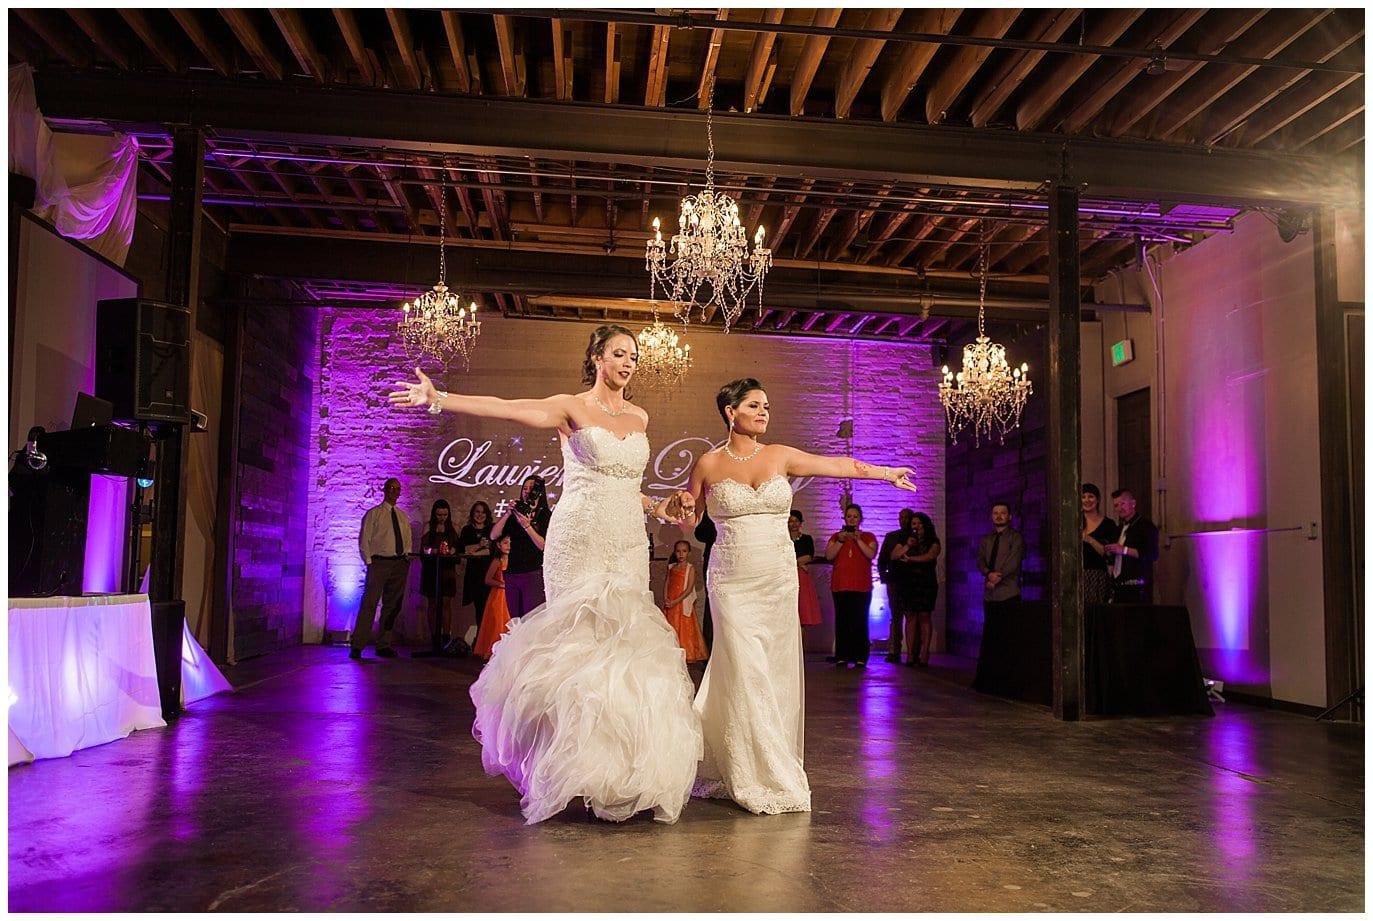 lesbian wedding first dance photo